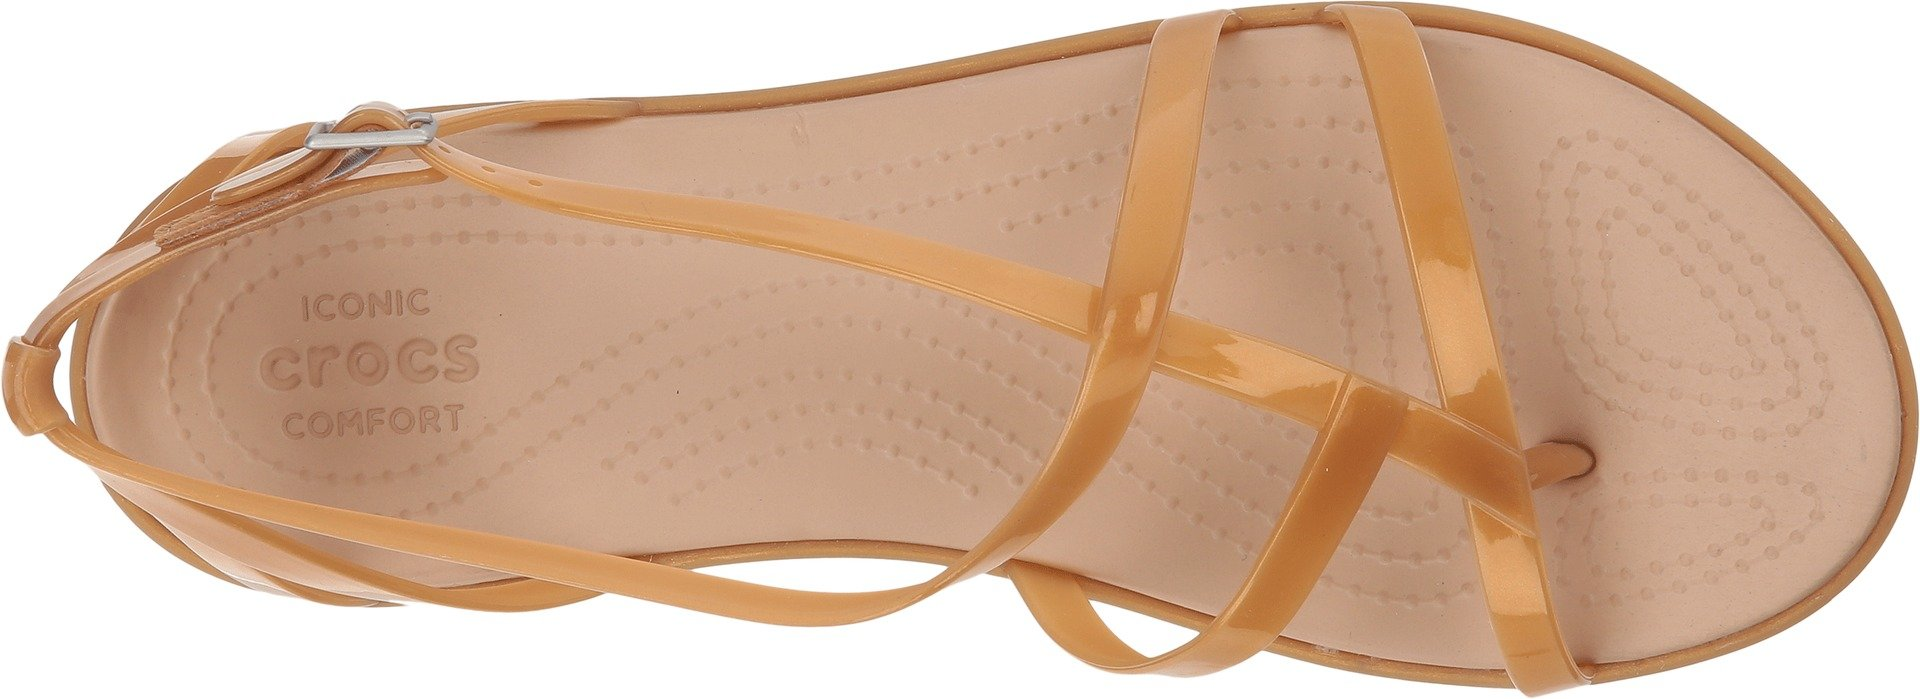 Crocs Women's Isabella Gladiator Sandal W Flat, Dark Gold, 6 M US by Crocs (Image #2)